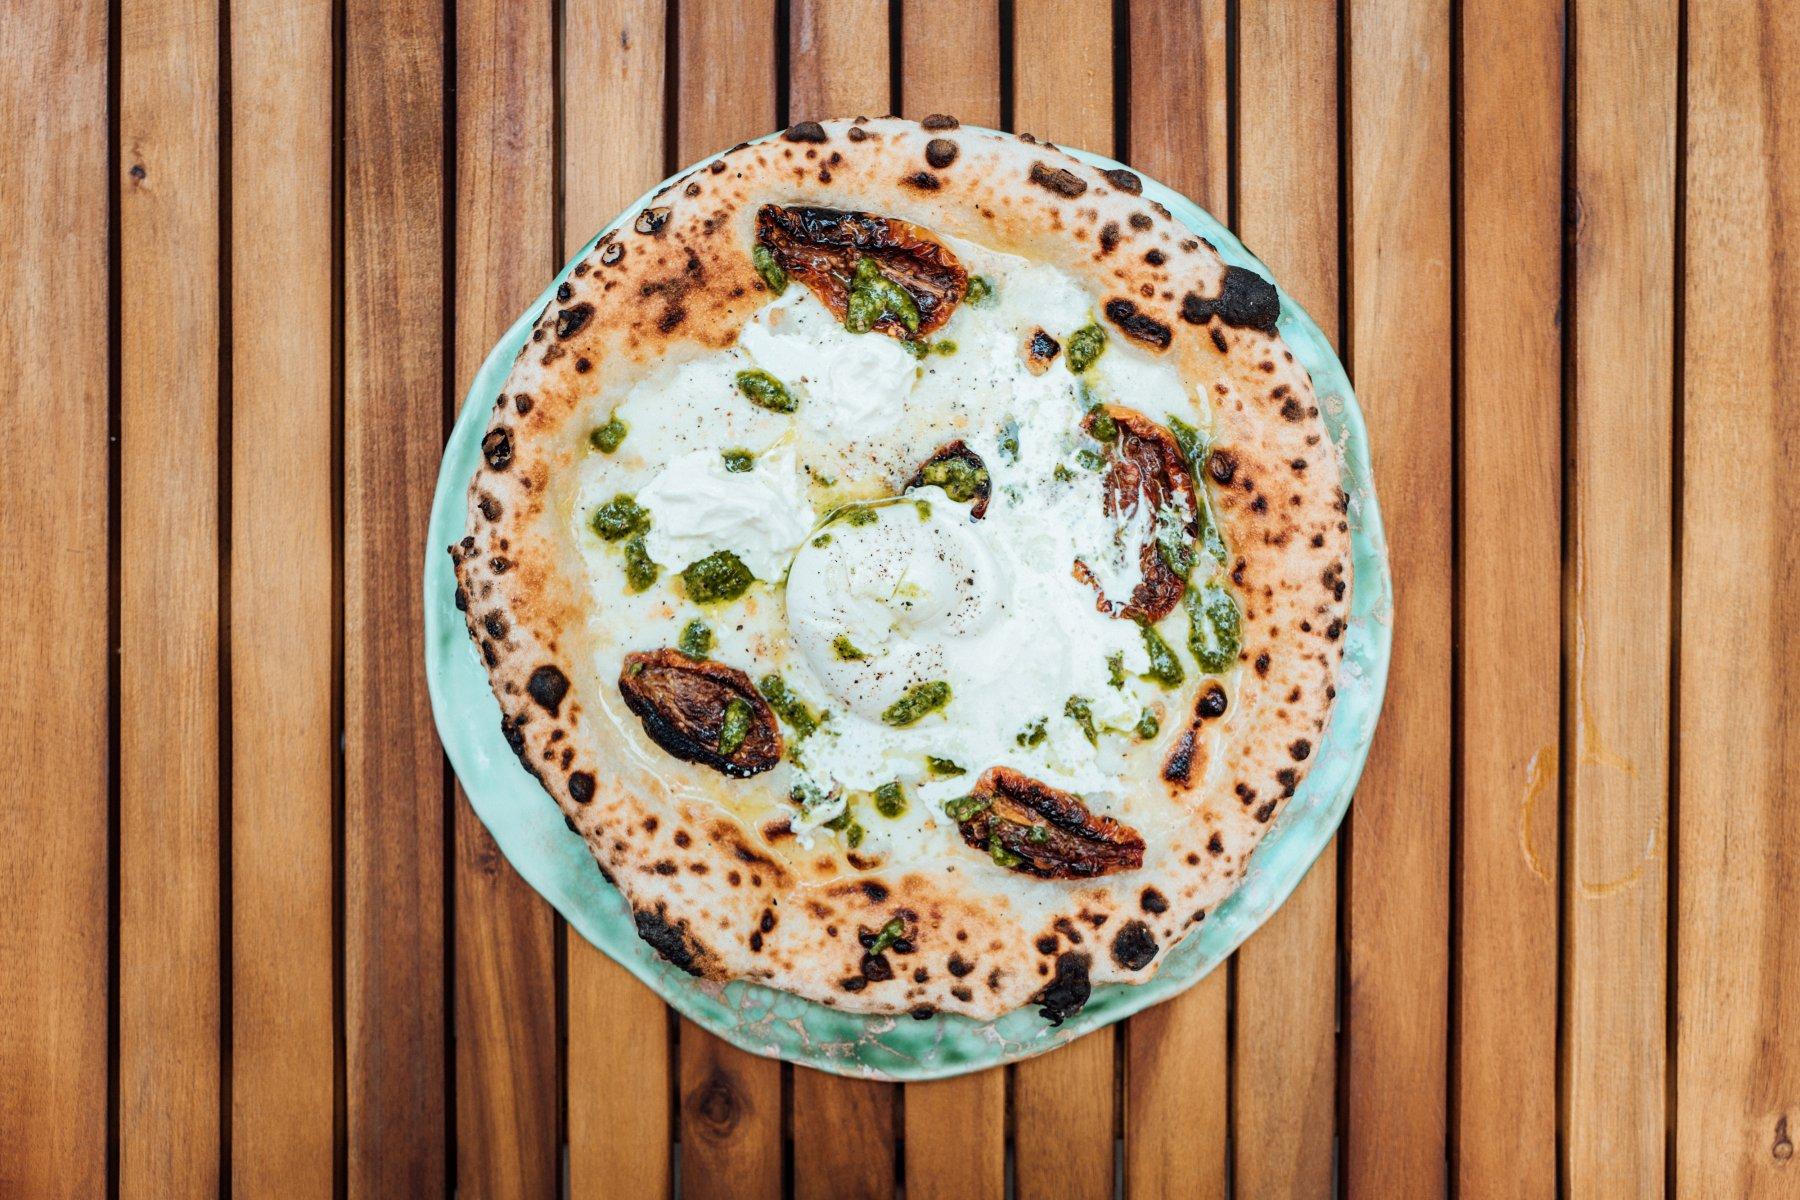 Tazzi Pizza St Pauli geheimtipp hamburg lisa knauer restaurant 46